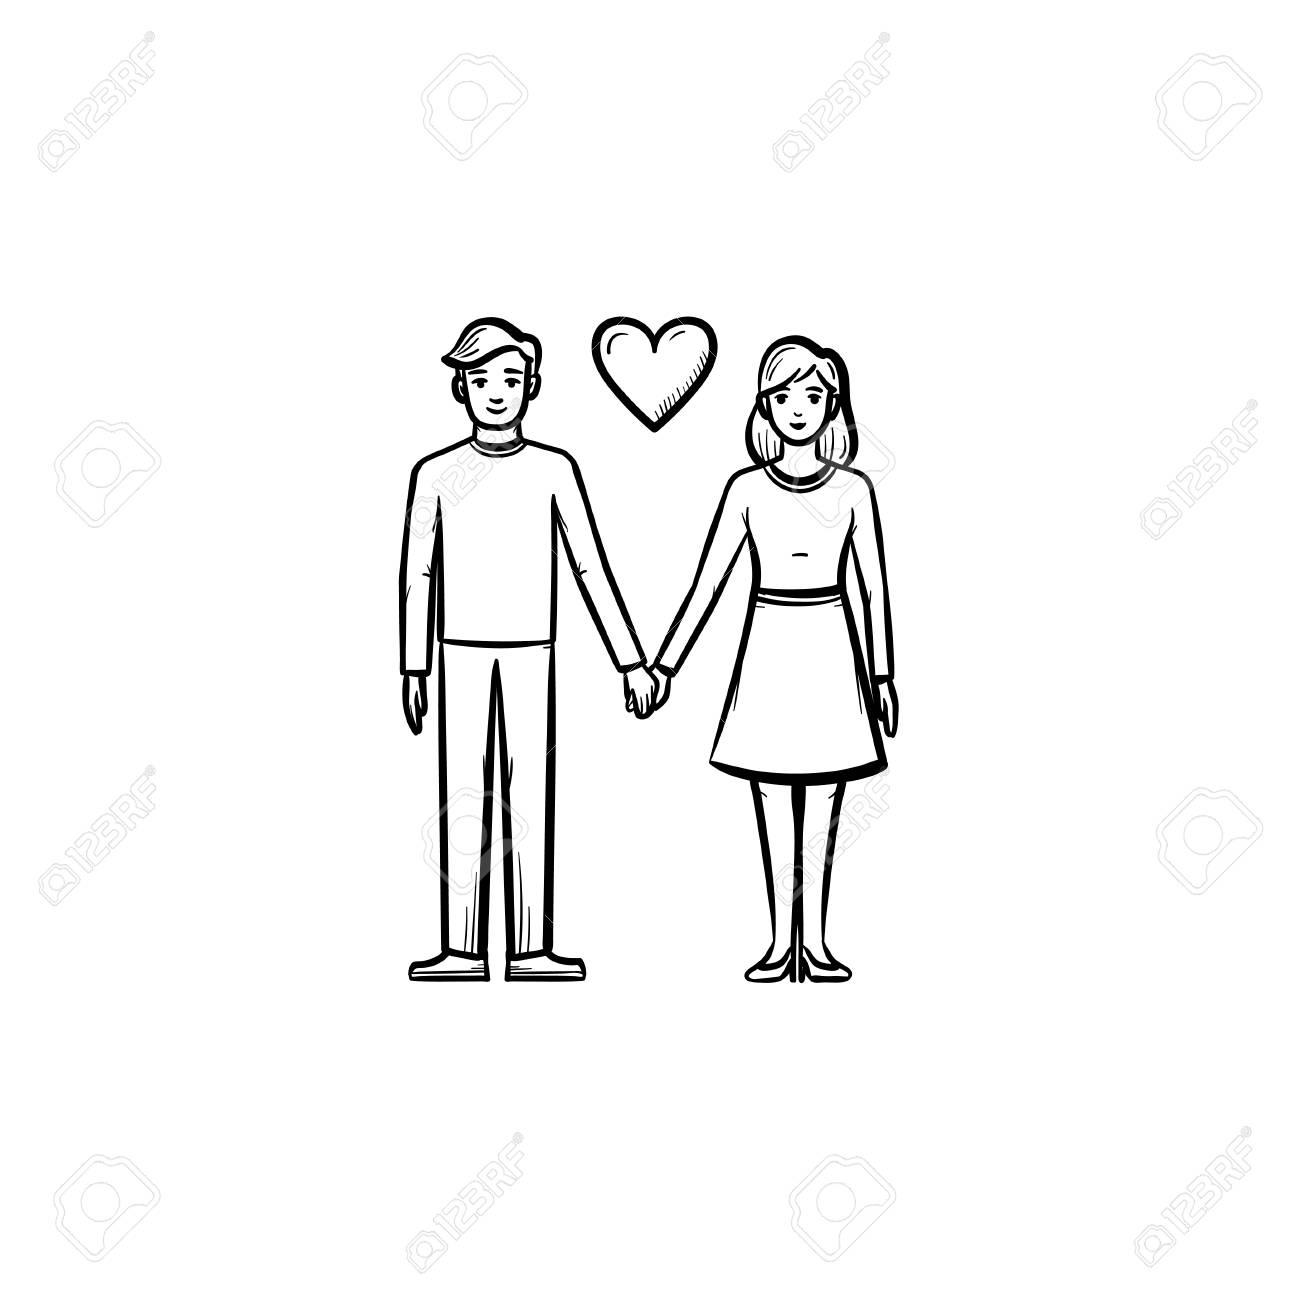 dating hoger opgeleiden gratis